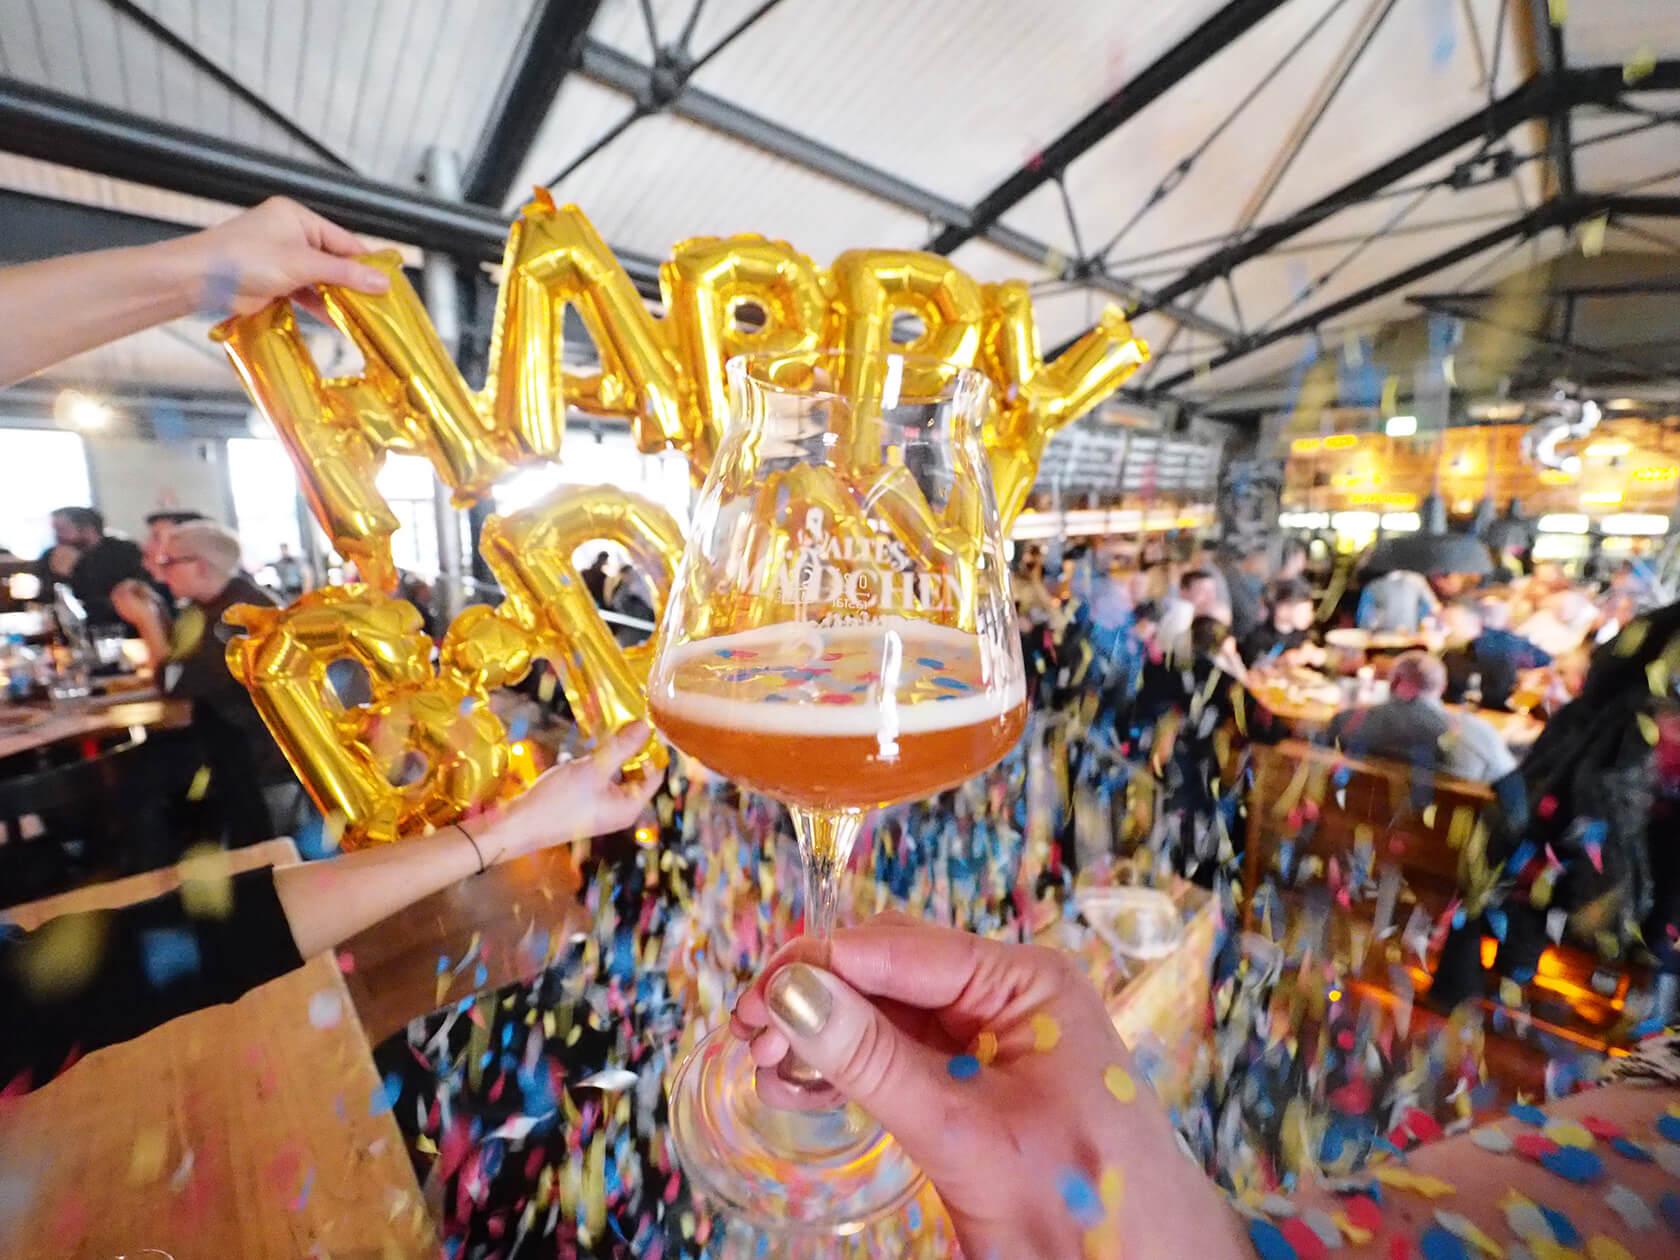 Altes Maedchen Hamburg, Geburtstag Hamburg